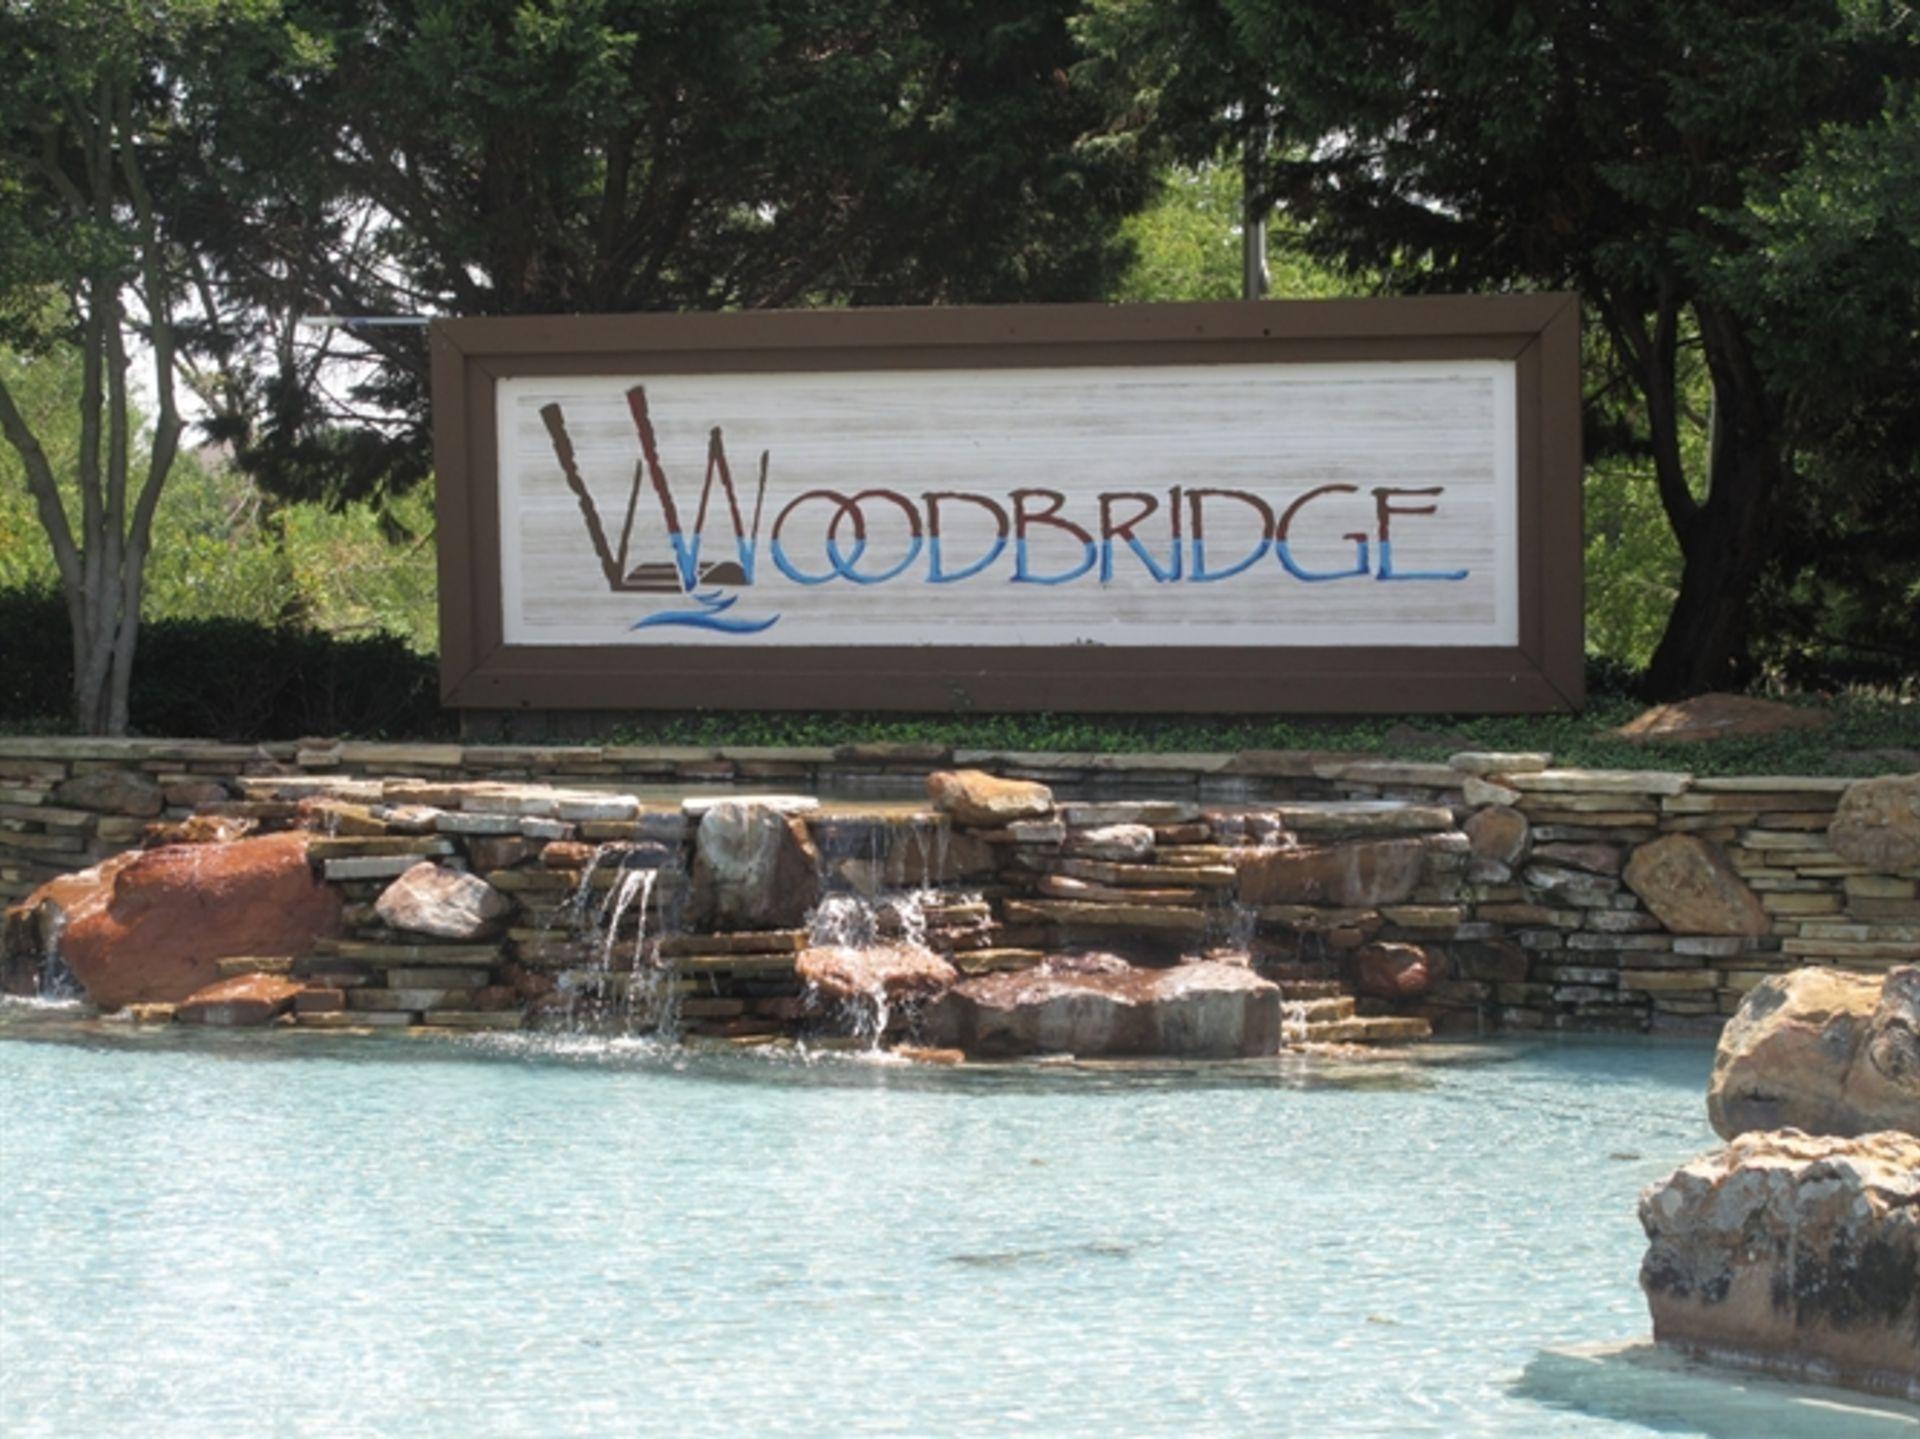 WOODBRIDGE HOA ANNUAL NEIGHBORHOOD REP ELECTIONS (OFFICIAL NOTICE)